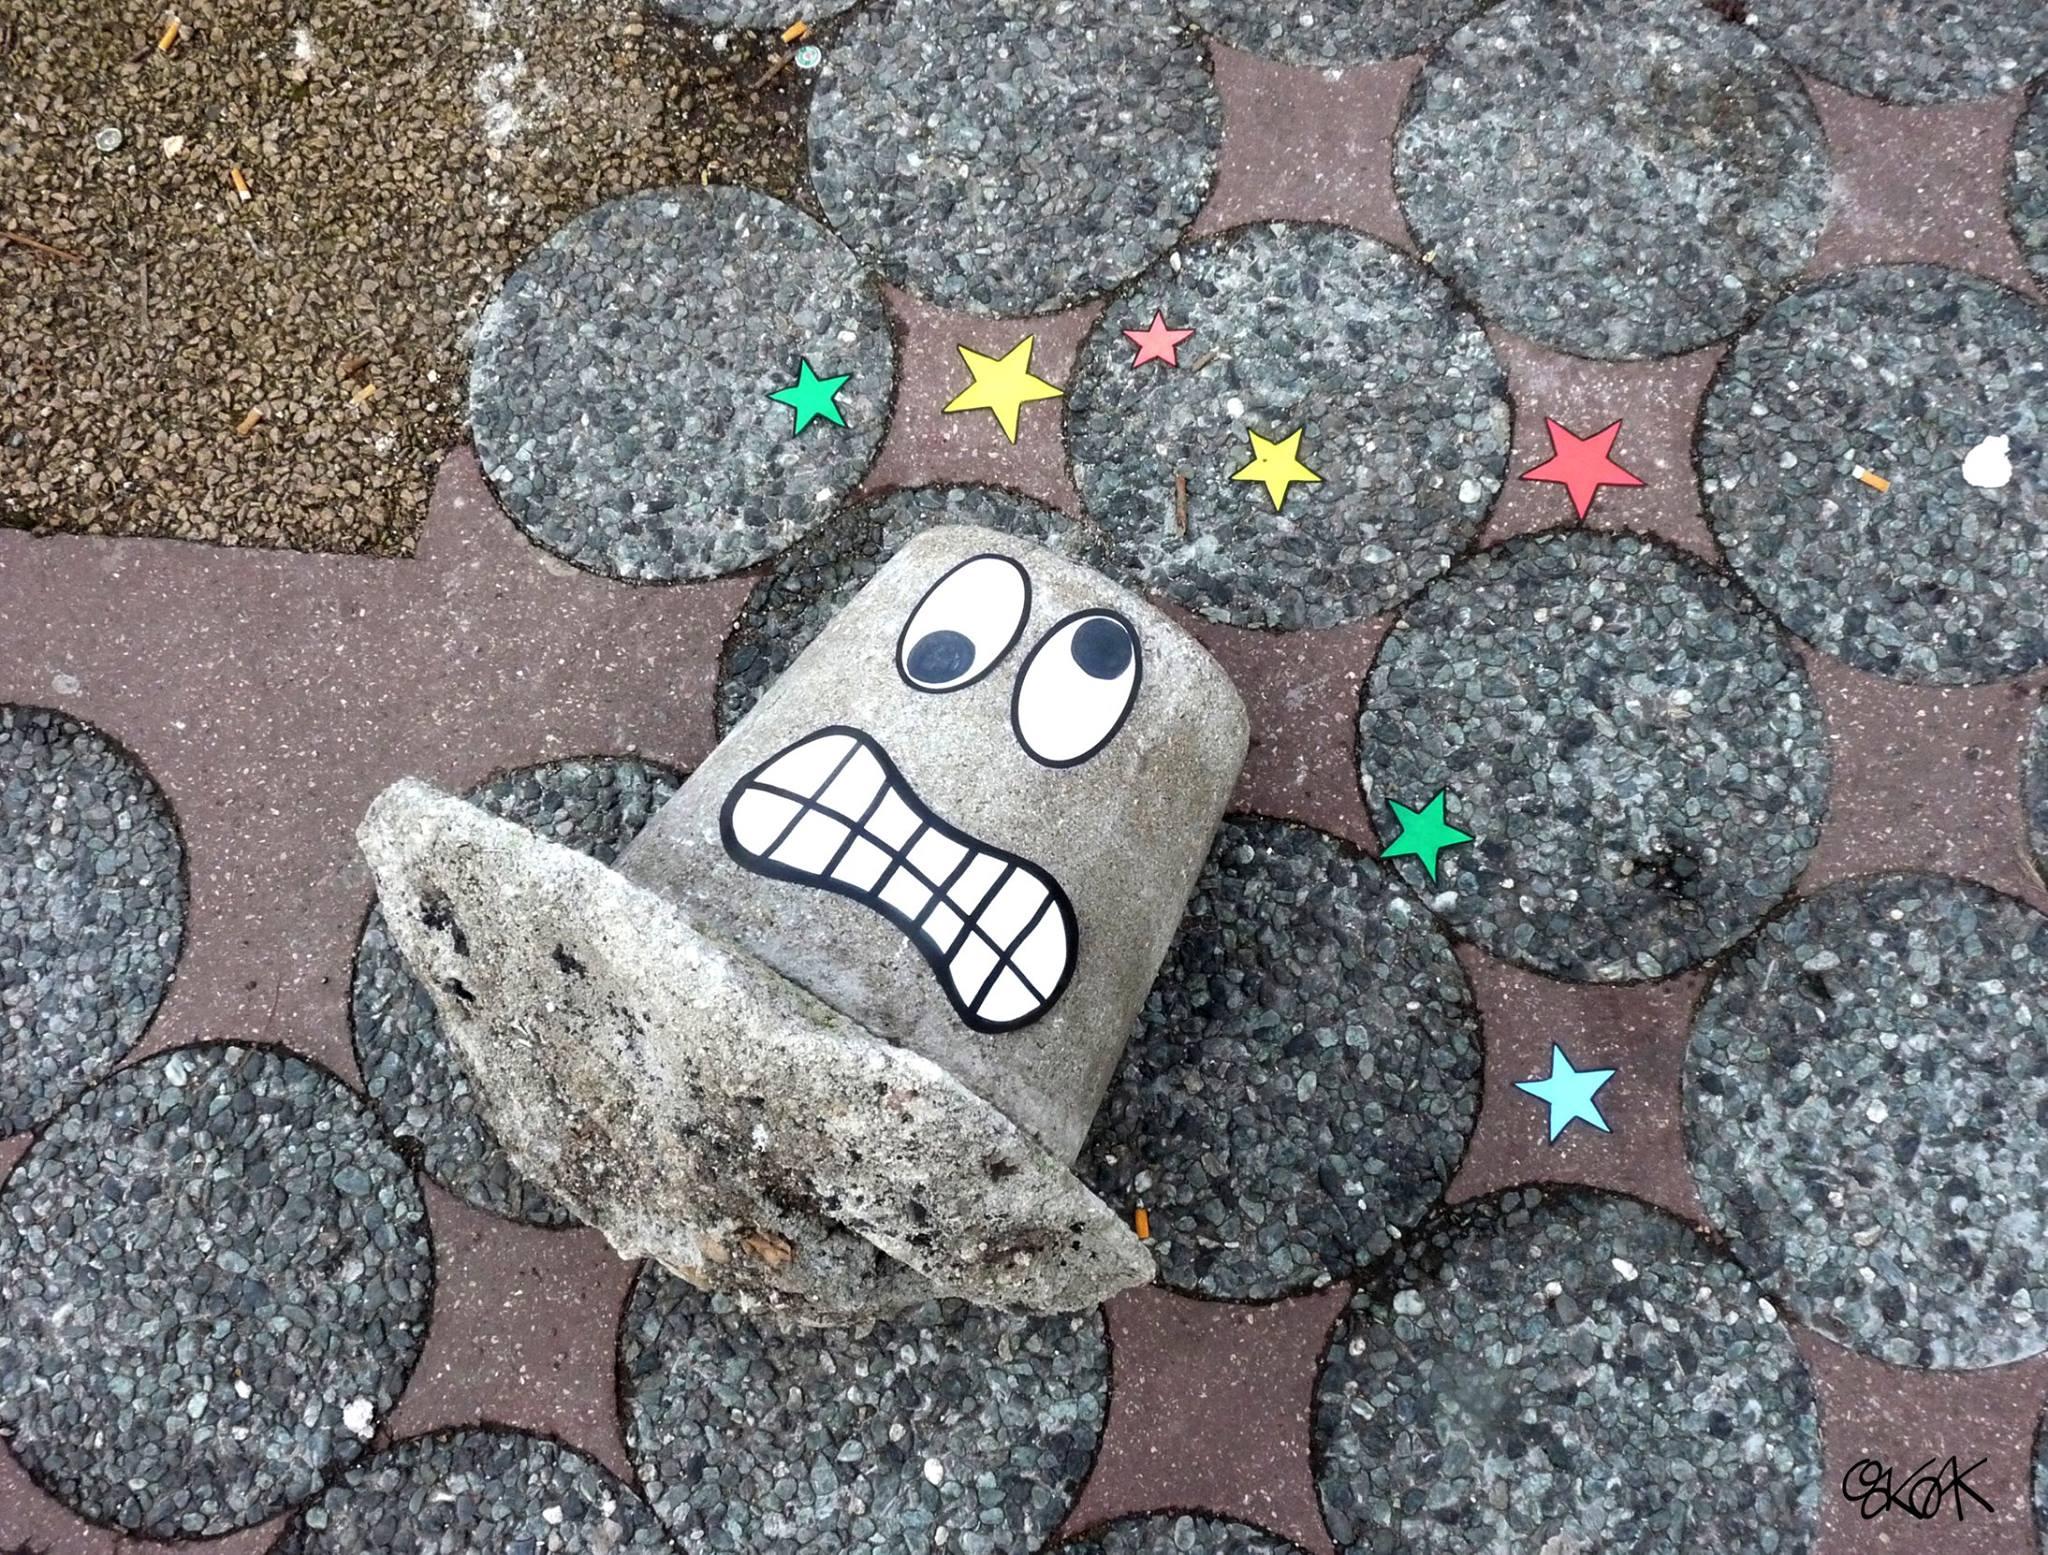 cool-street-art-from-paris-oak-oak-part2-14